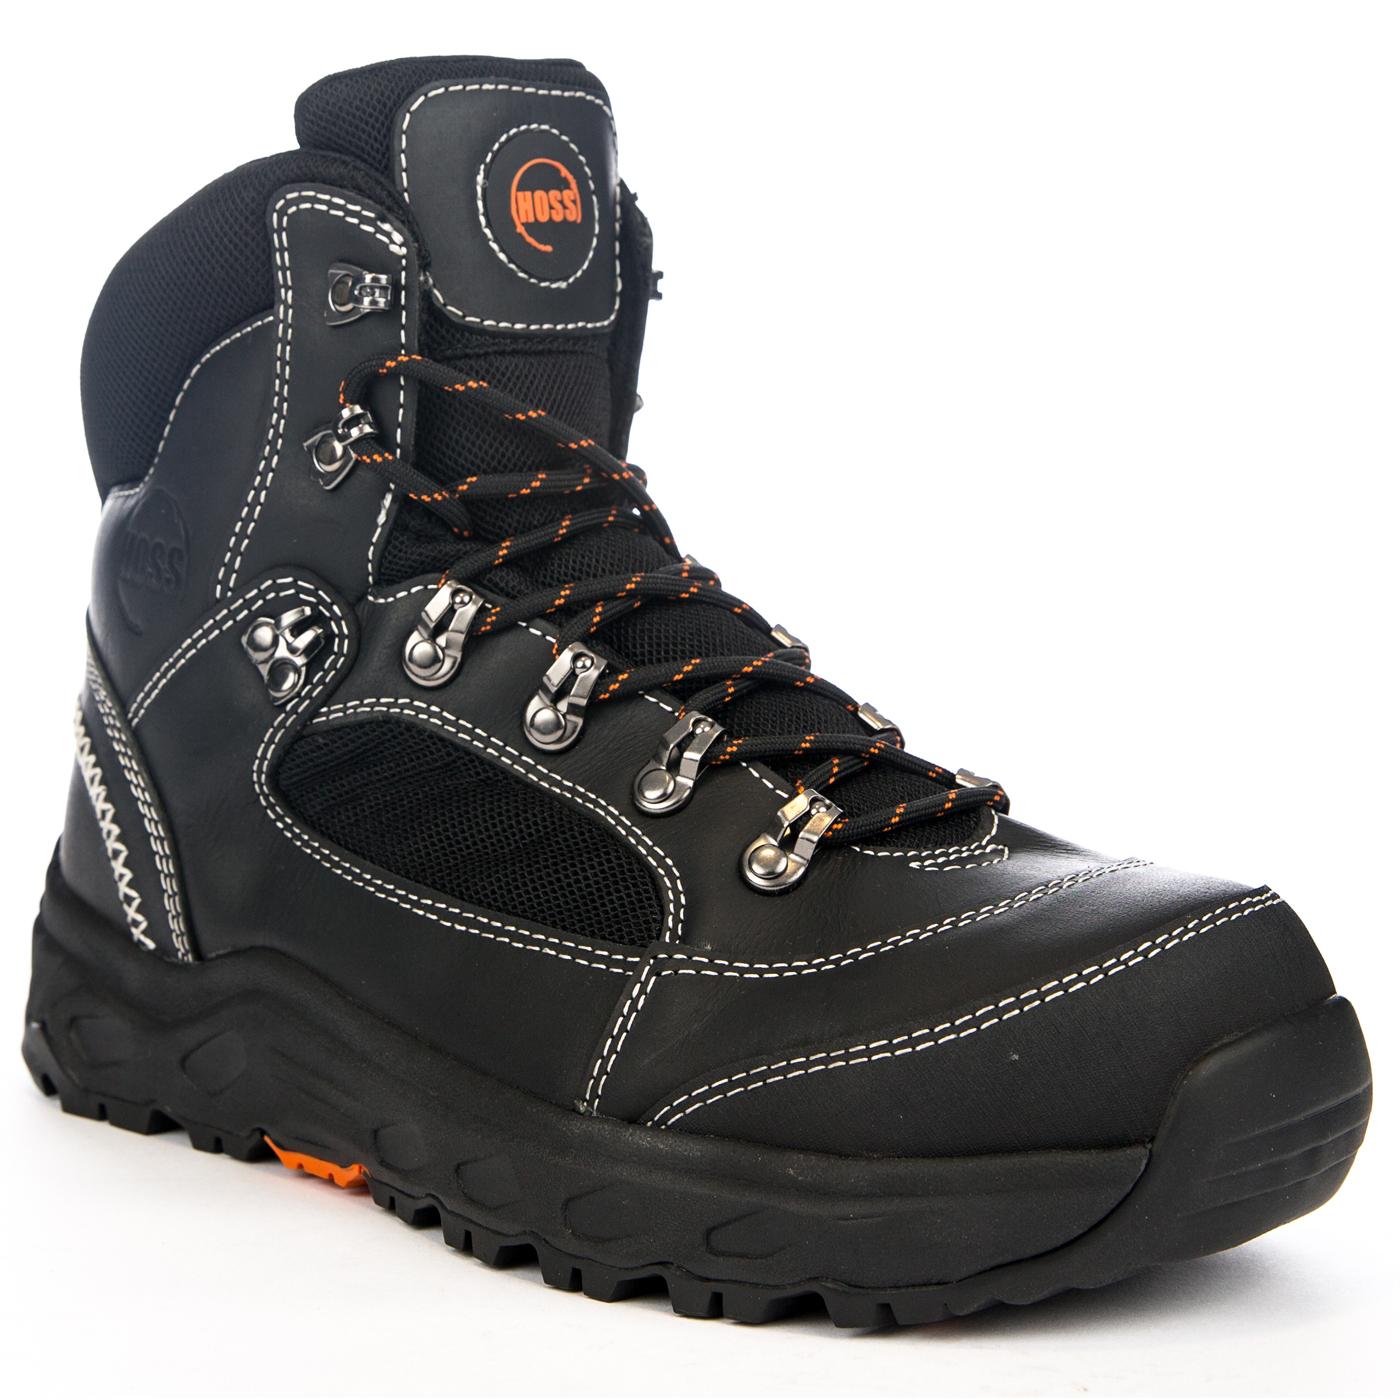 a92b24b8e14 HOSS Blocker Men's 6 inch Aluminum Toe Electrical Hazard Waterproof Work  Hiker